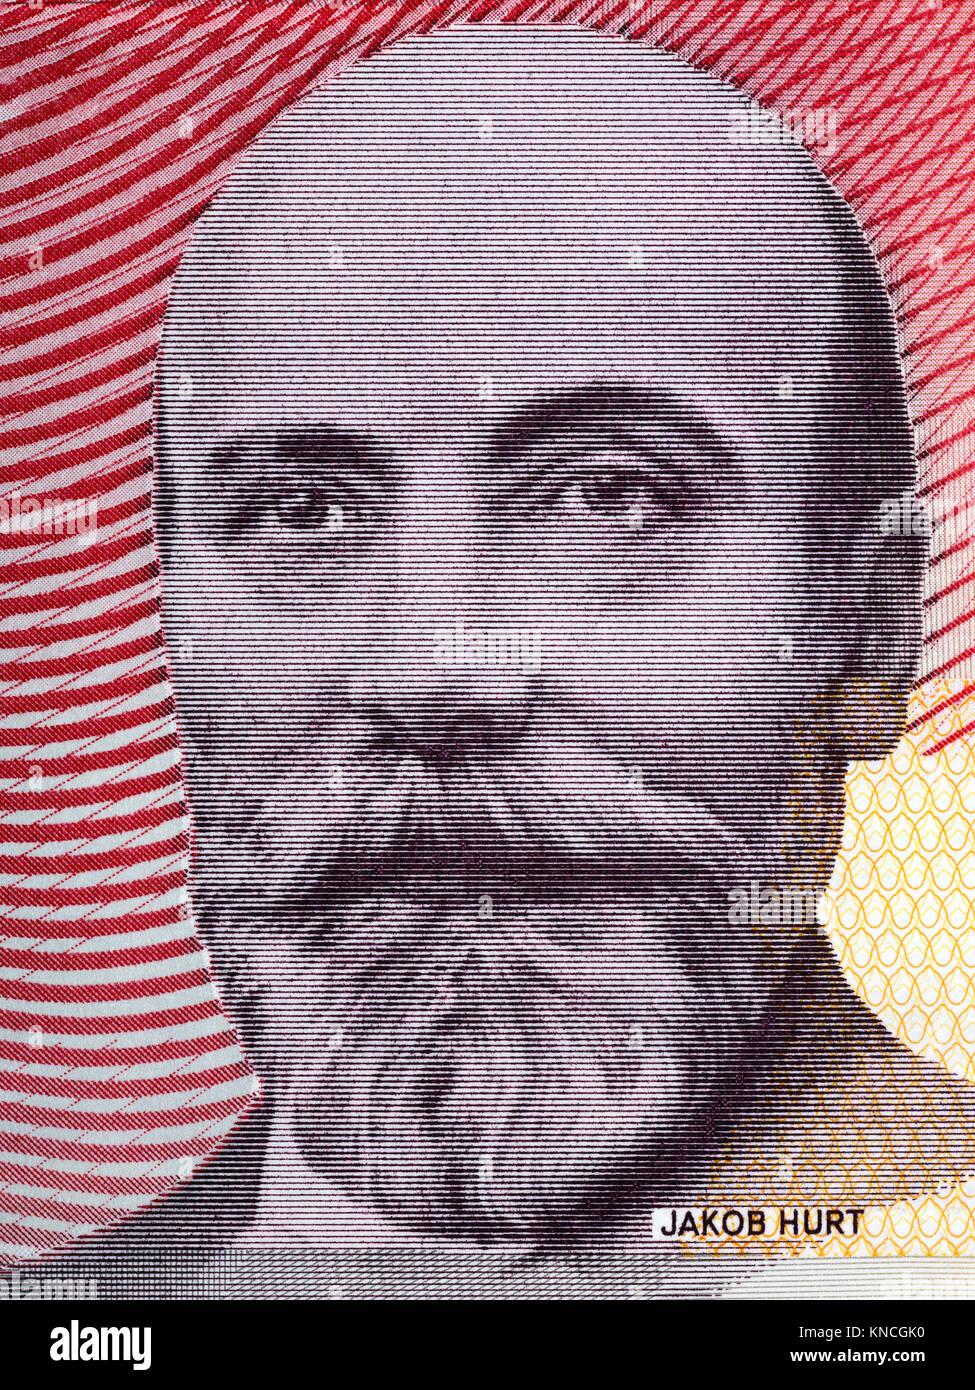 Jakob Hurt portrait from Estonian money - Stock Image